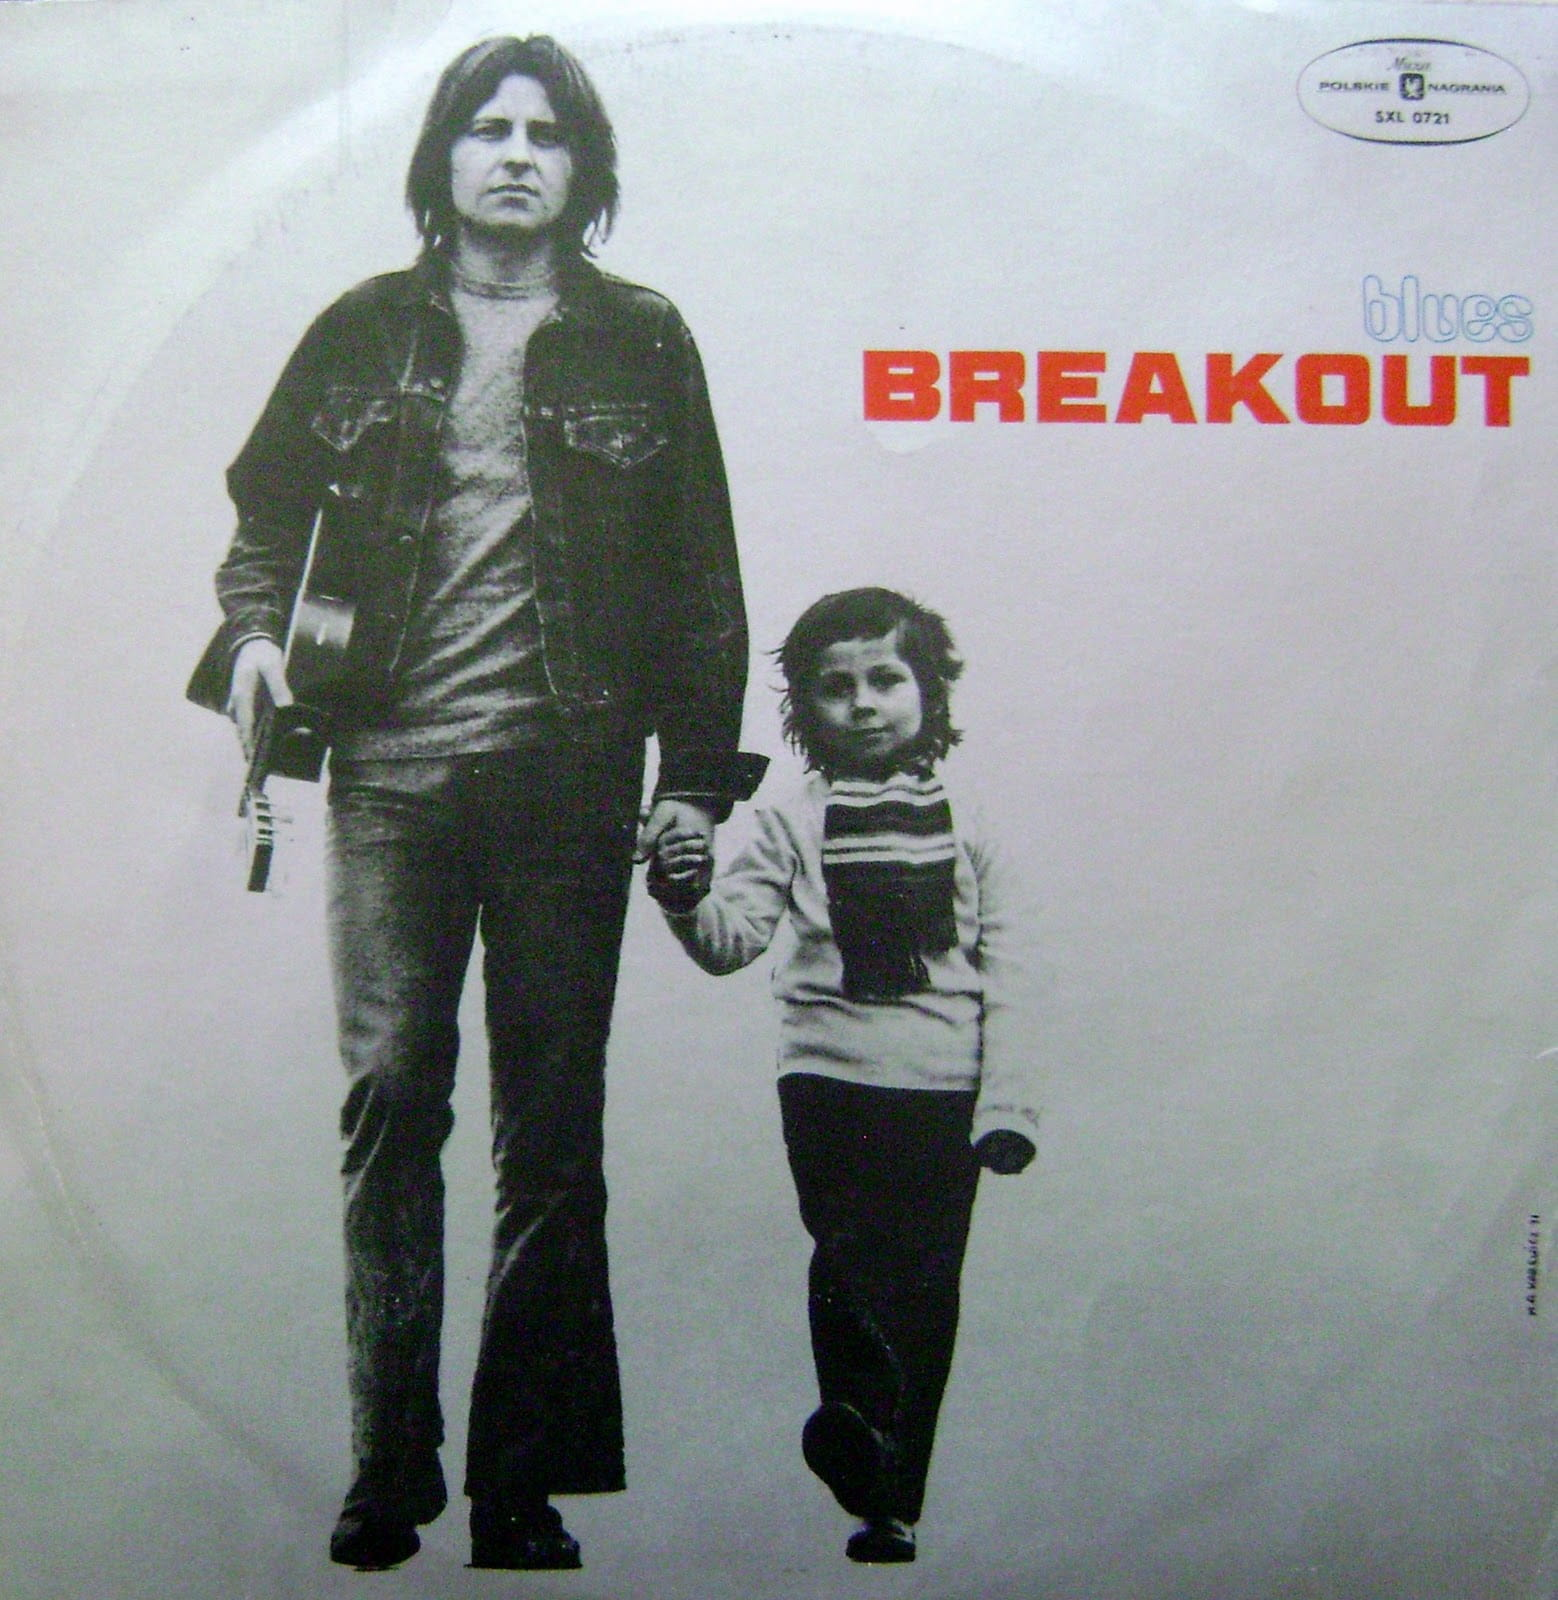 Breakout Blues Płyta Winylowa Winyl Rocksklep Pl